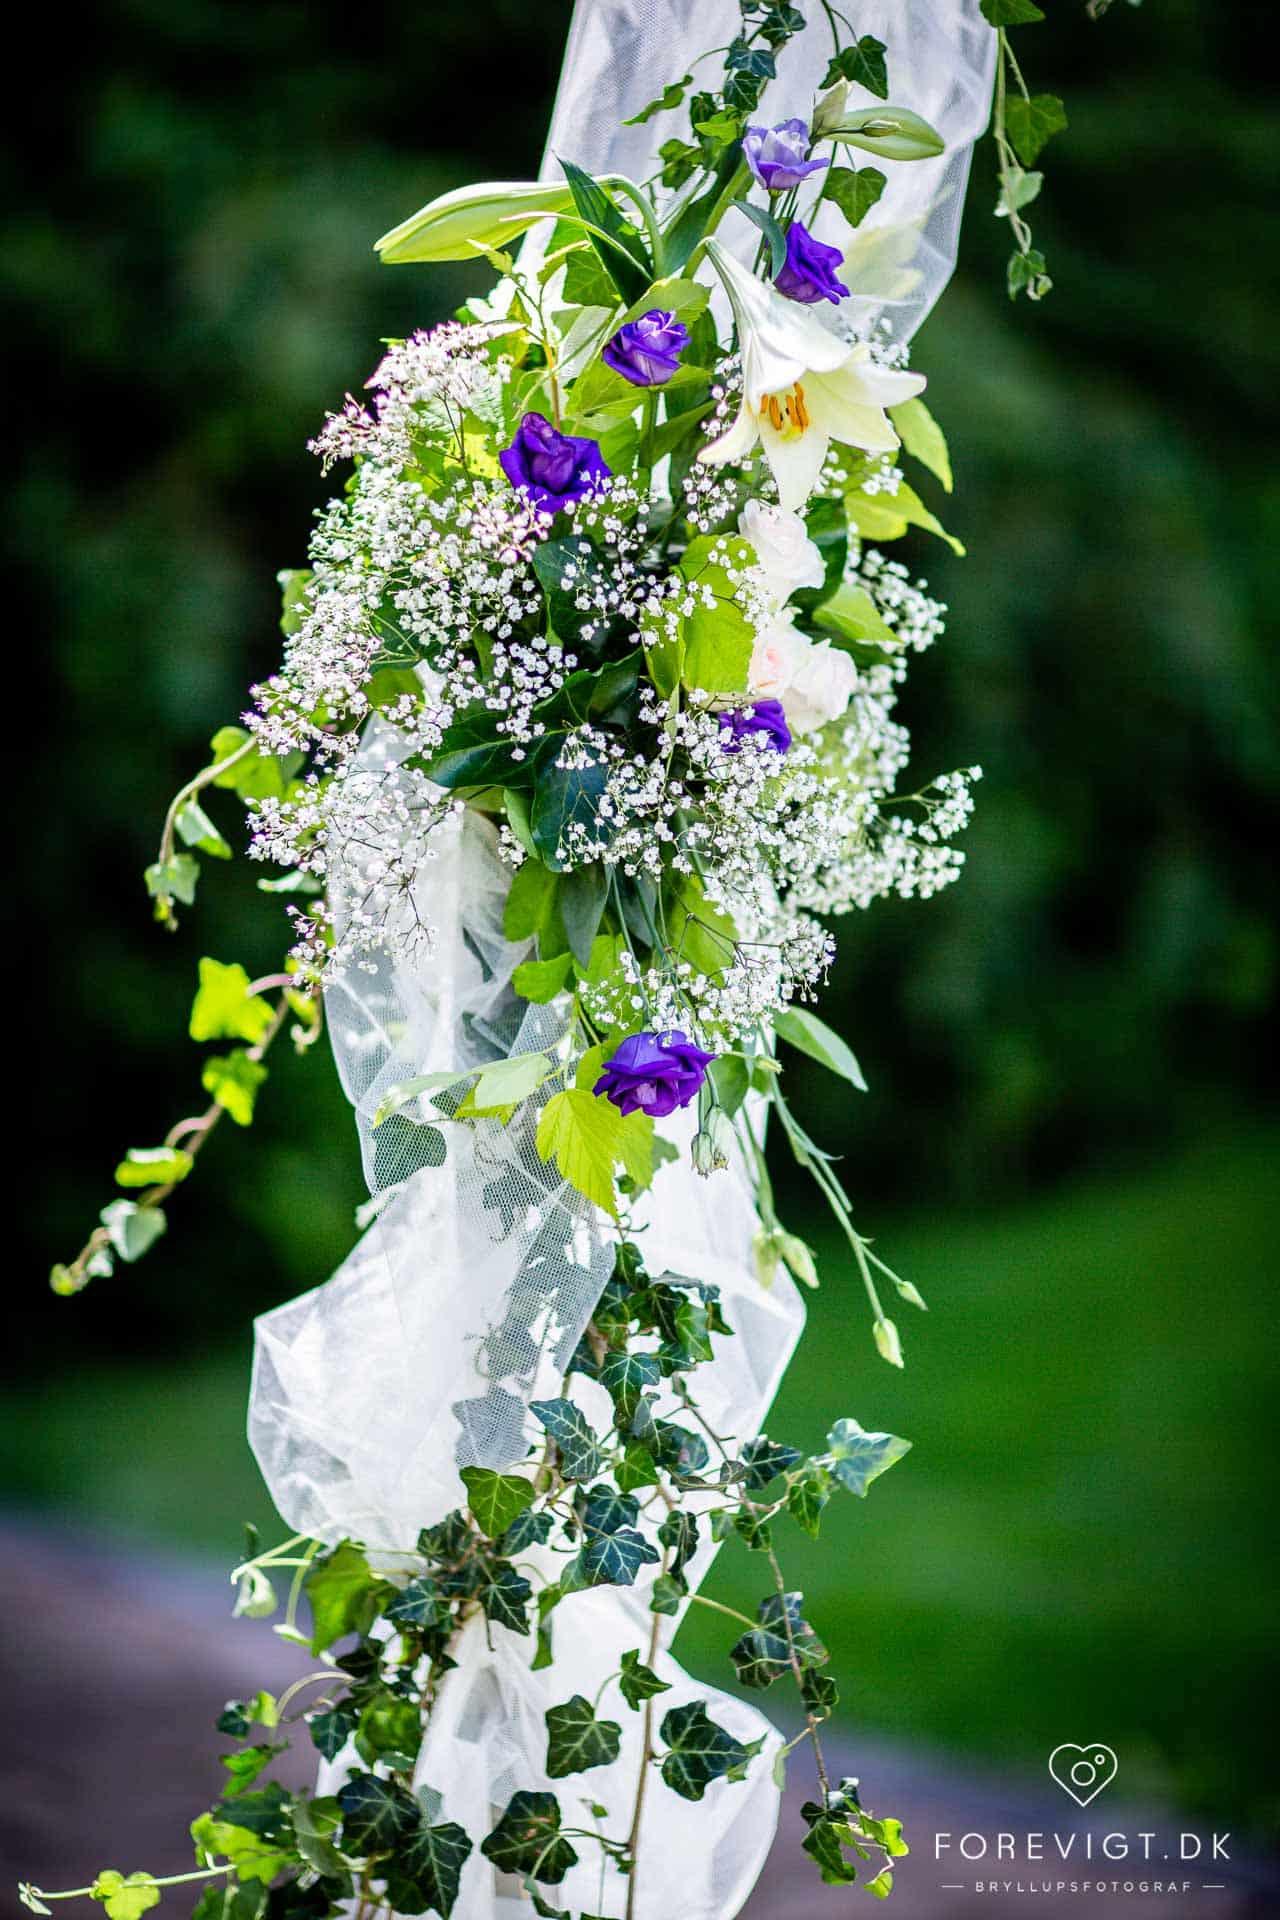 Borgerlig vielse - Rådhus bryllup